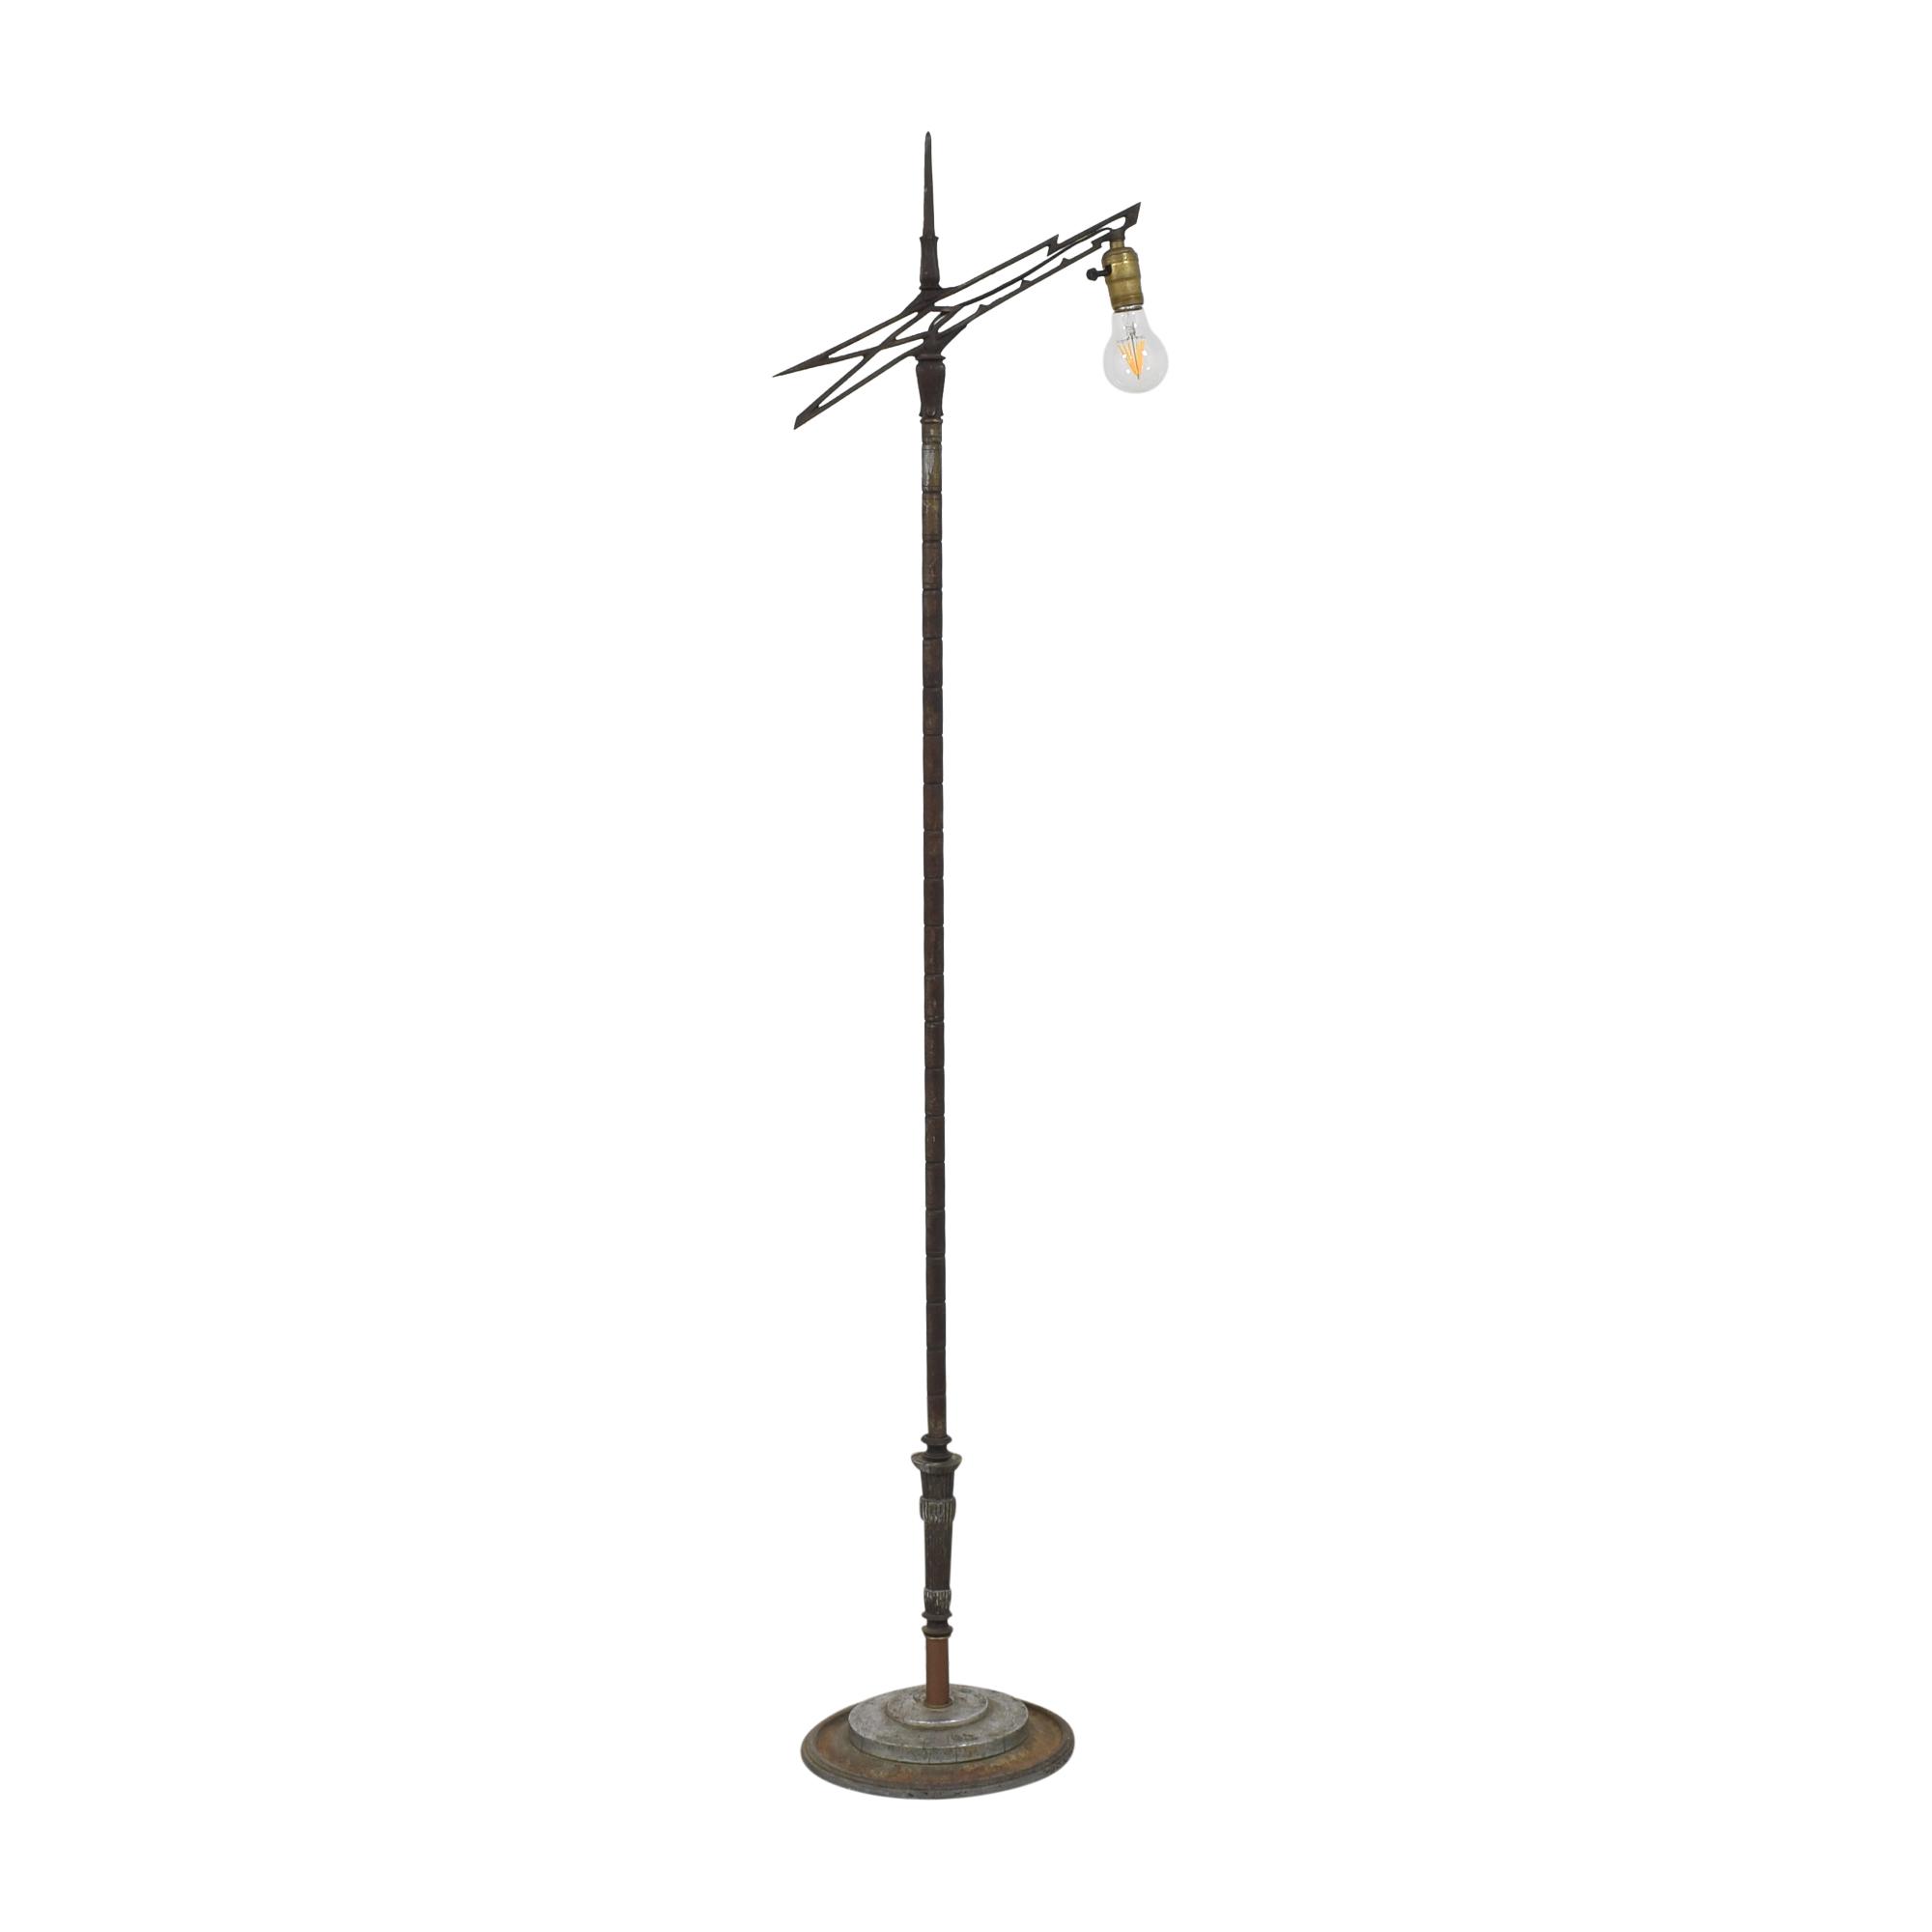 Stylized Floor Lamp / Lamps